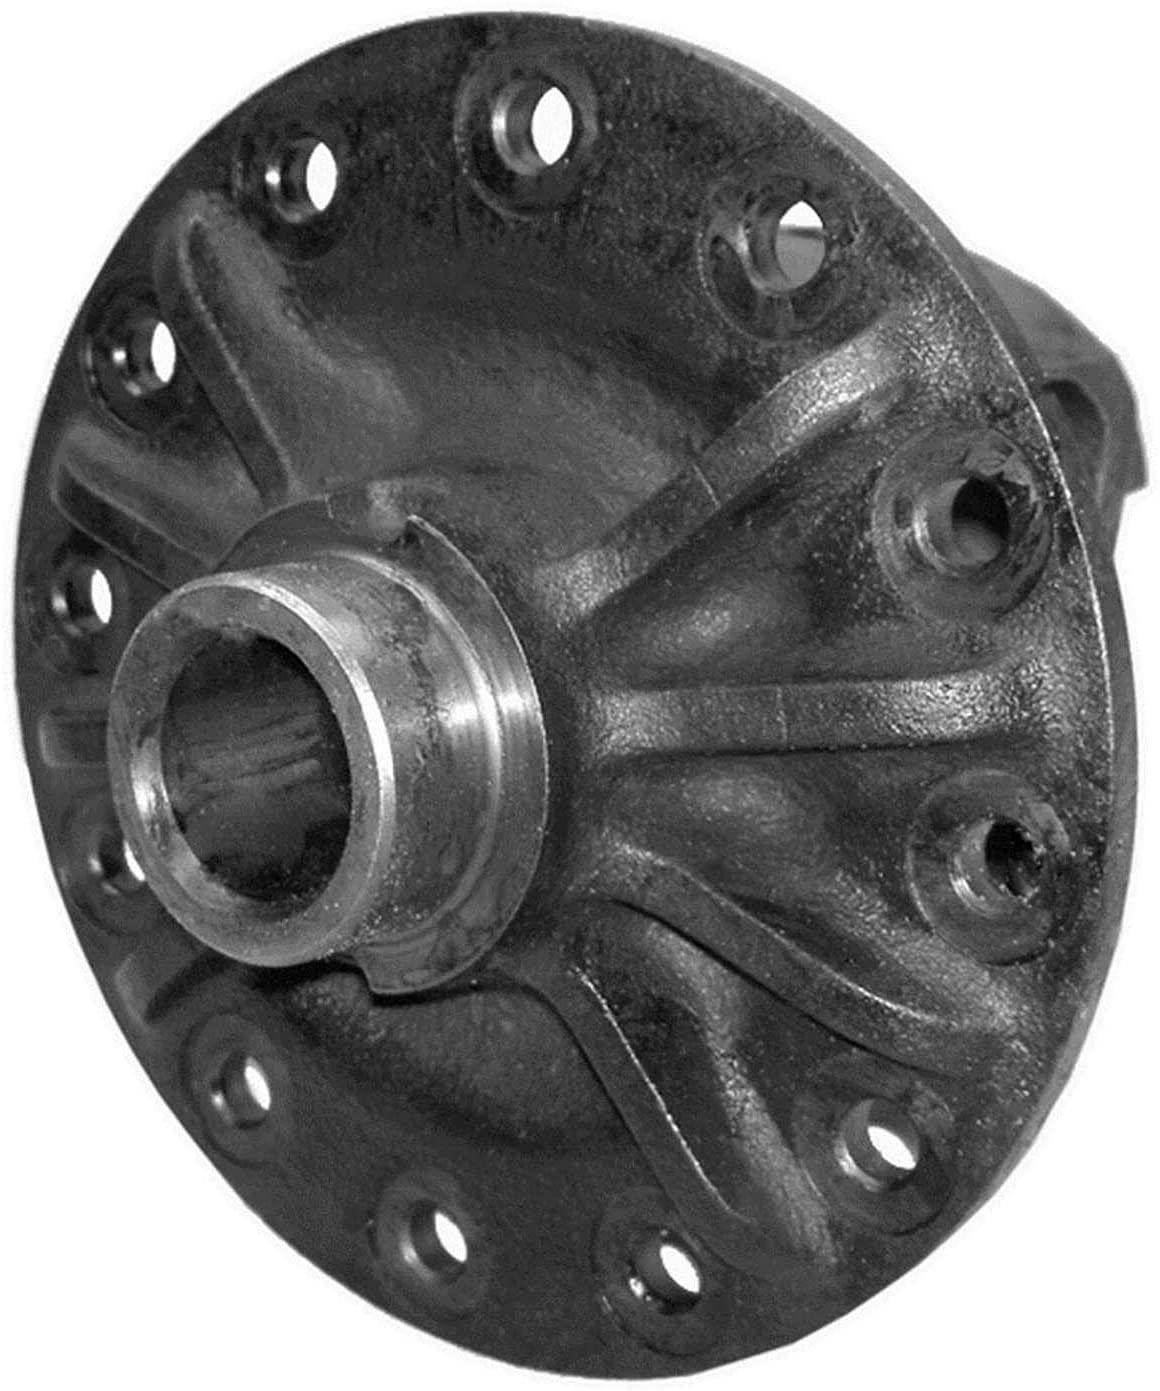 Motive Gear (14038087) Differential Carrier Case, 9.5